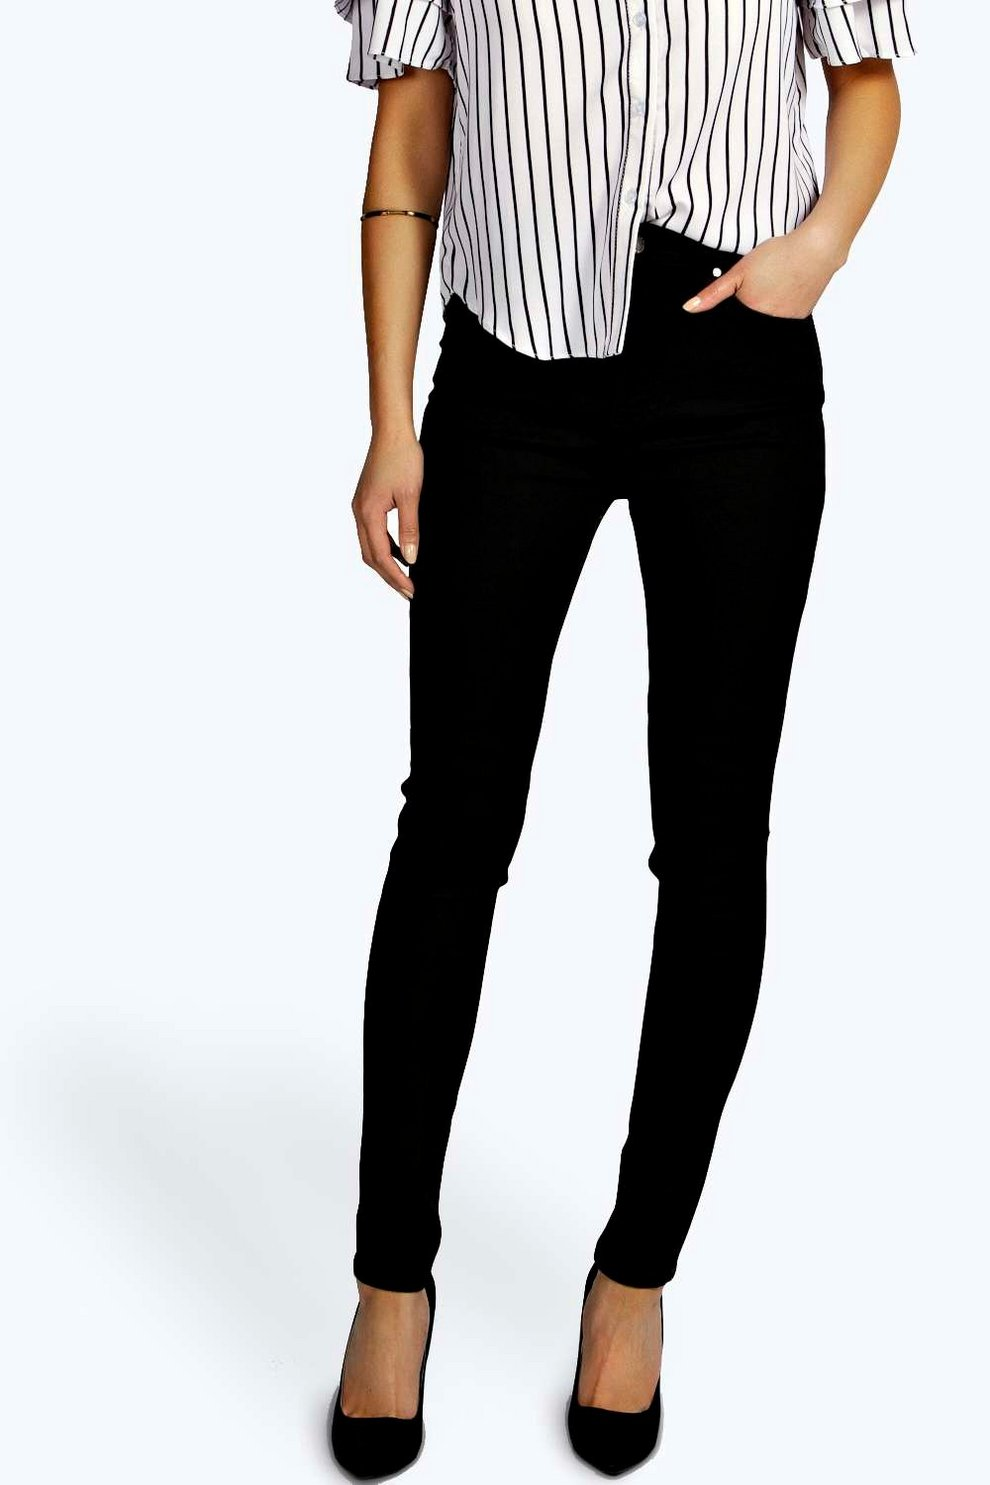 59a144557f175 High Waisted Skinny Tube Jeans